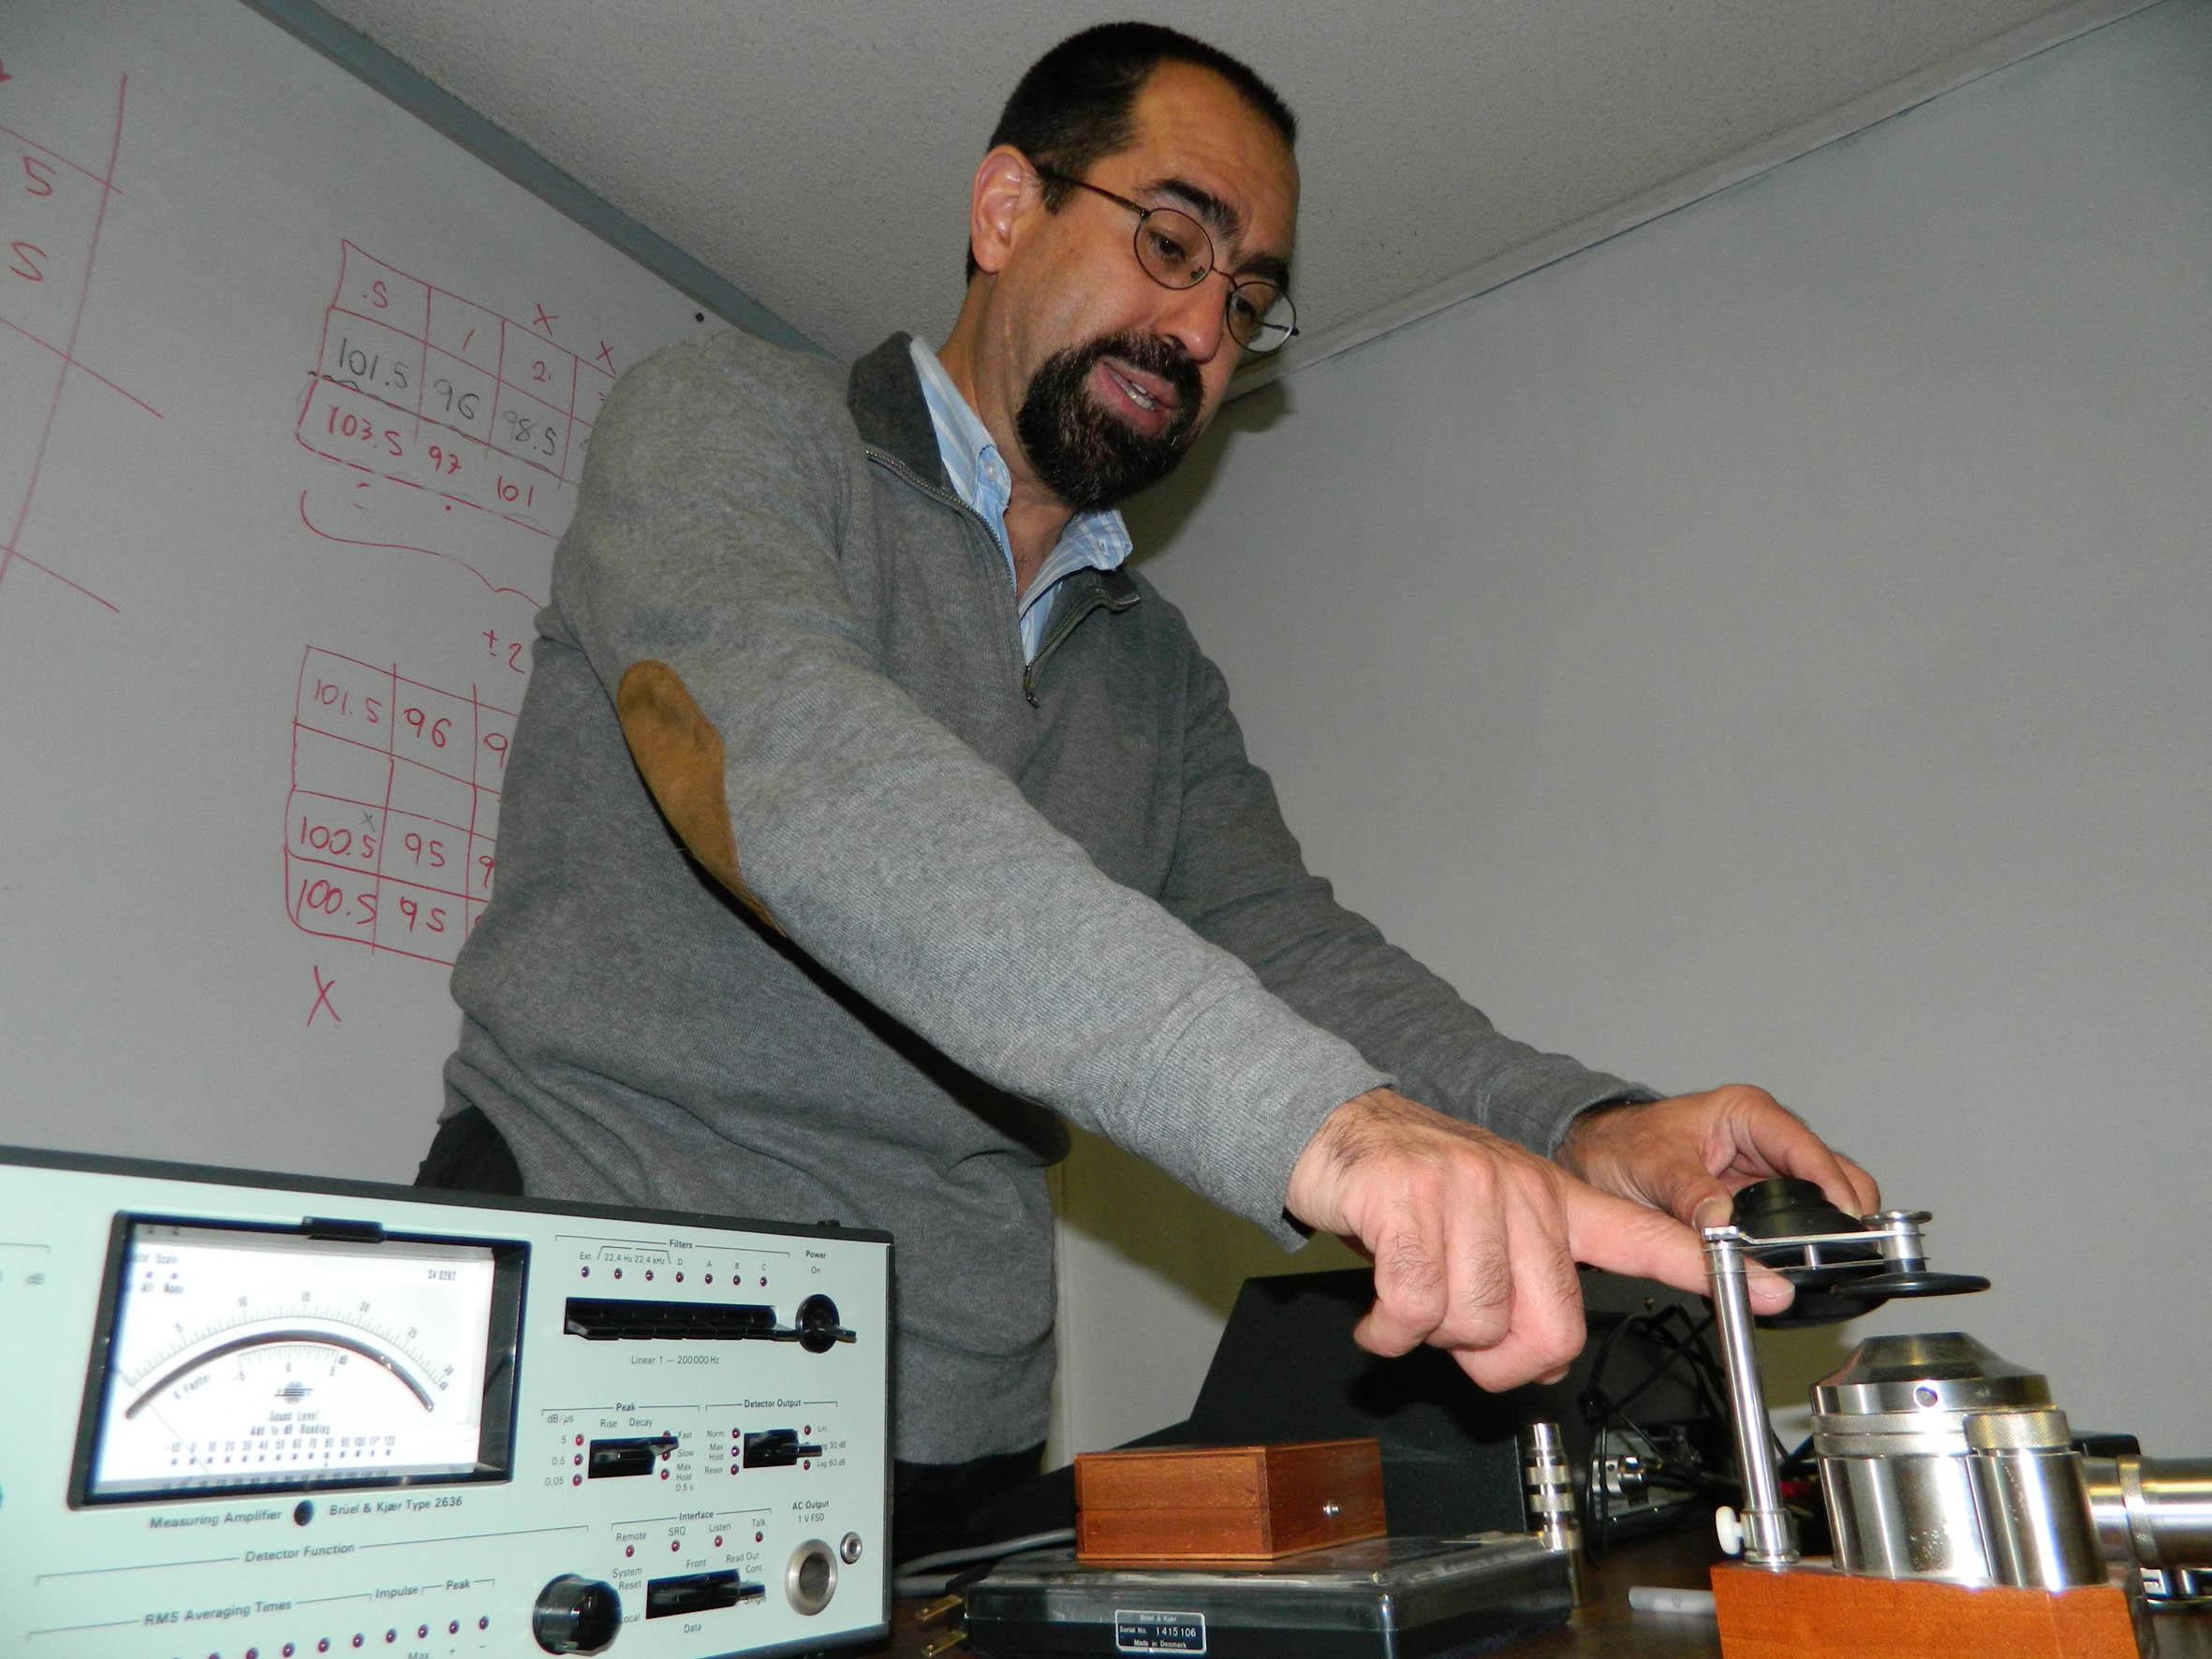 Dr. Felipe Orduña Bustamante